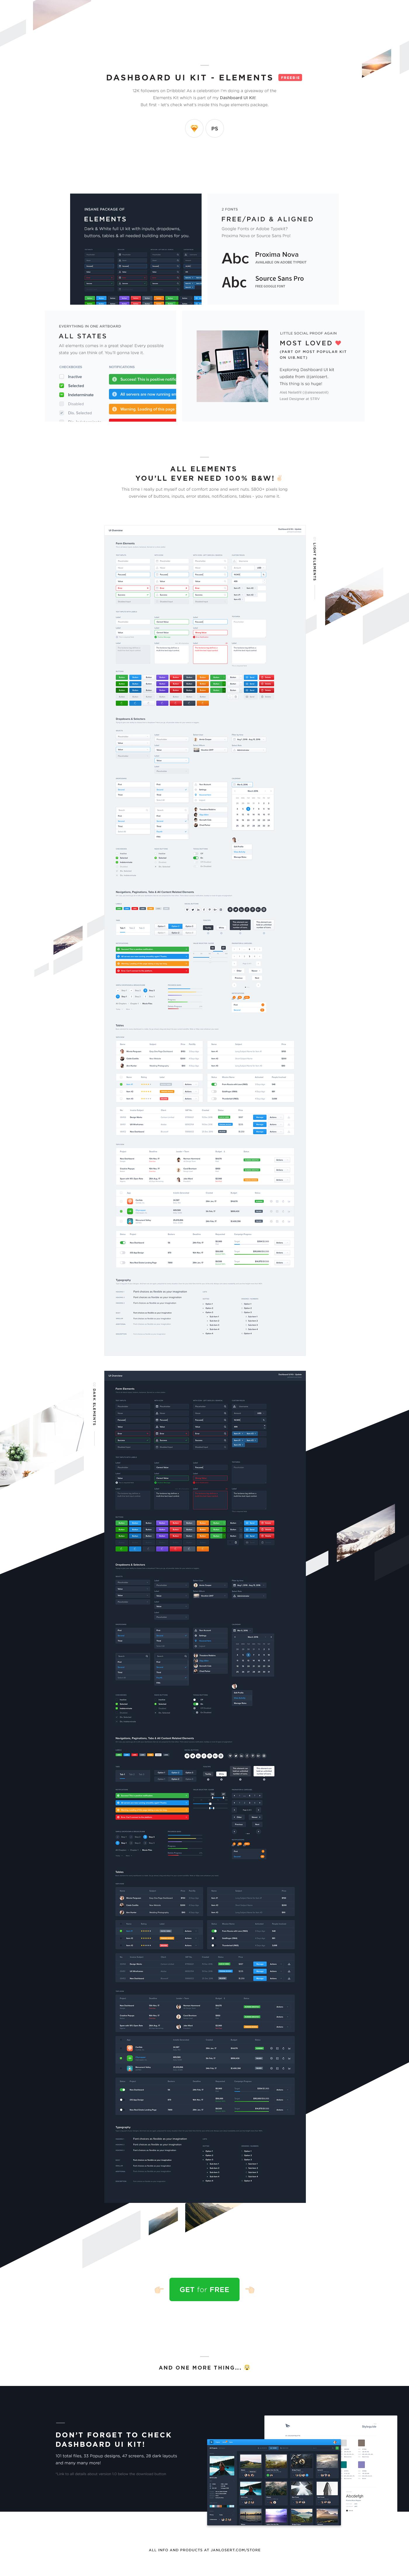 Upload Center Dashboard UI Kit New Screen t